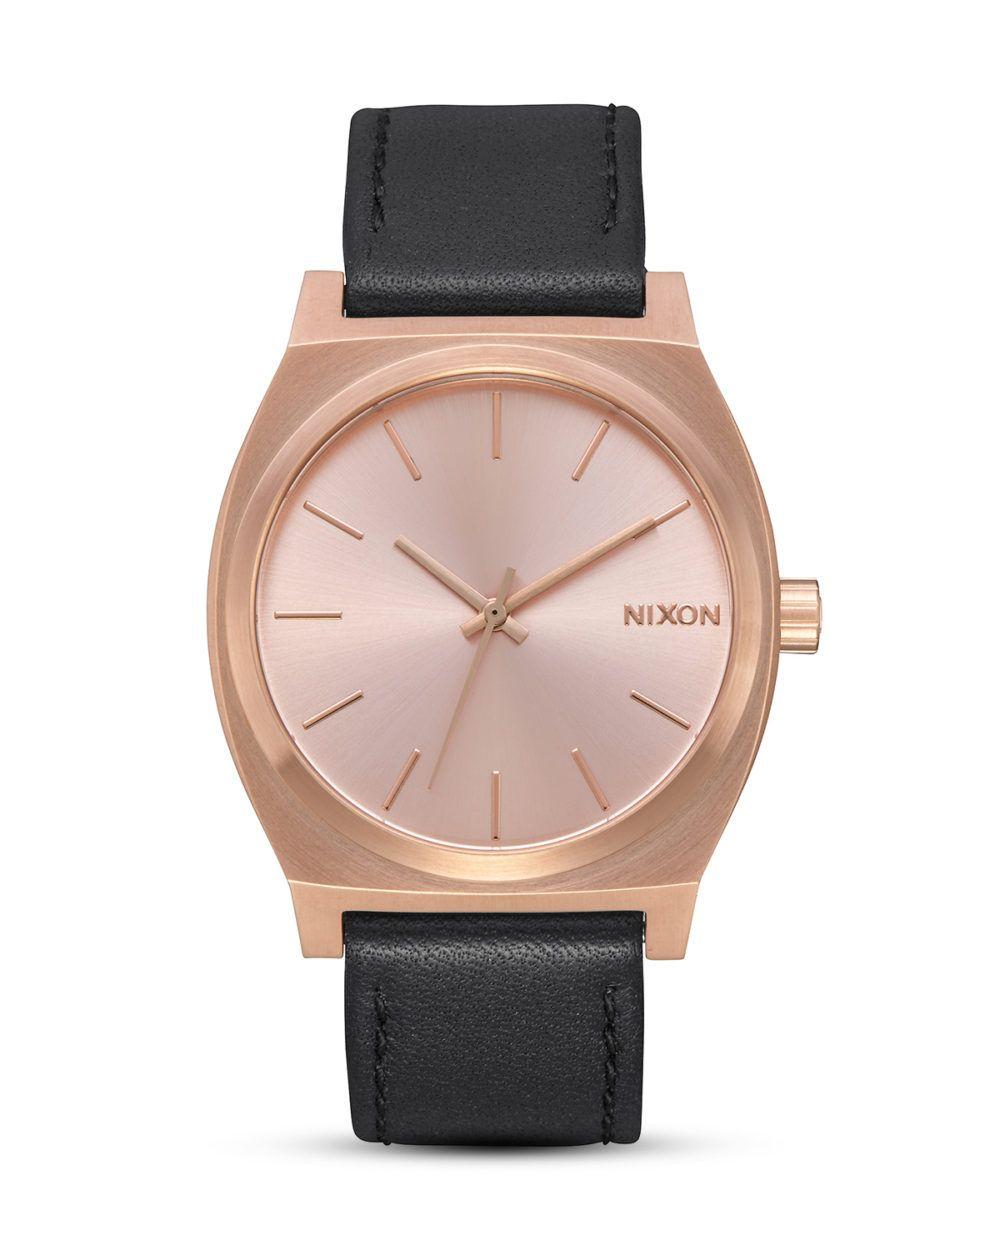 NIXON, Quarzuhr Time Teller A045-1932 All Rose Gold / Black